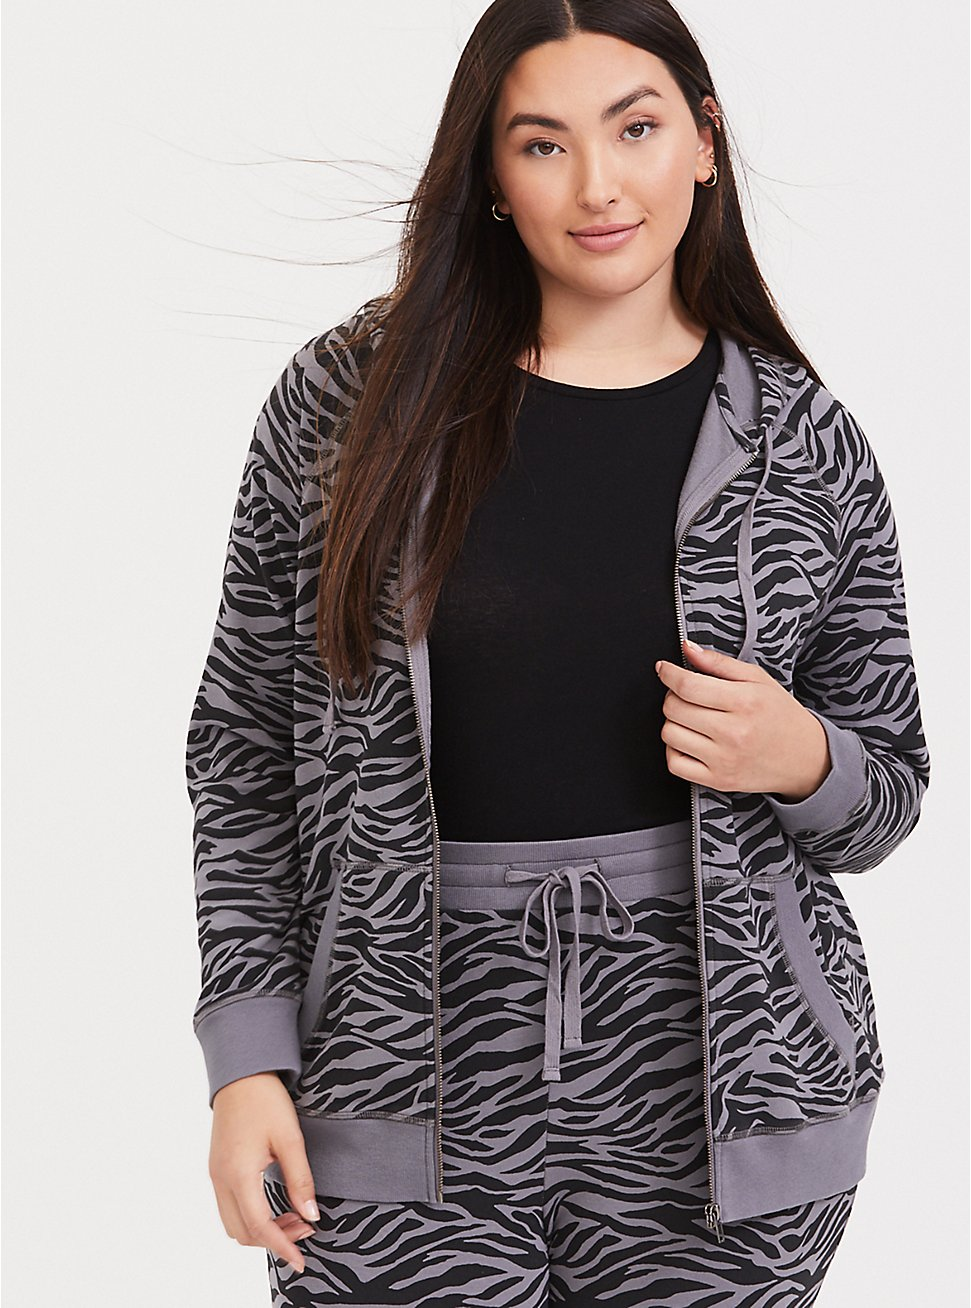 Slate Grey & Black Zebra Print Zip Hoodie, SIENNA ZEBRA, hi-res